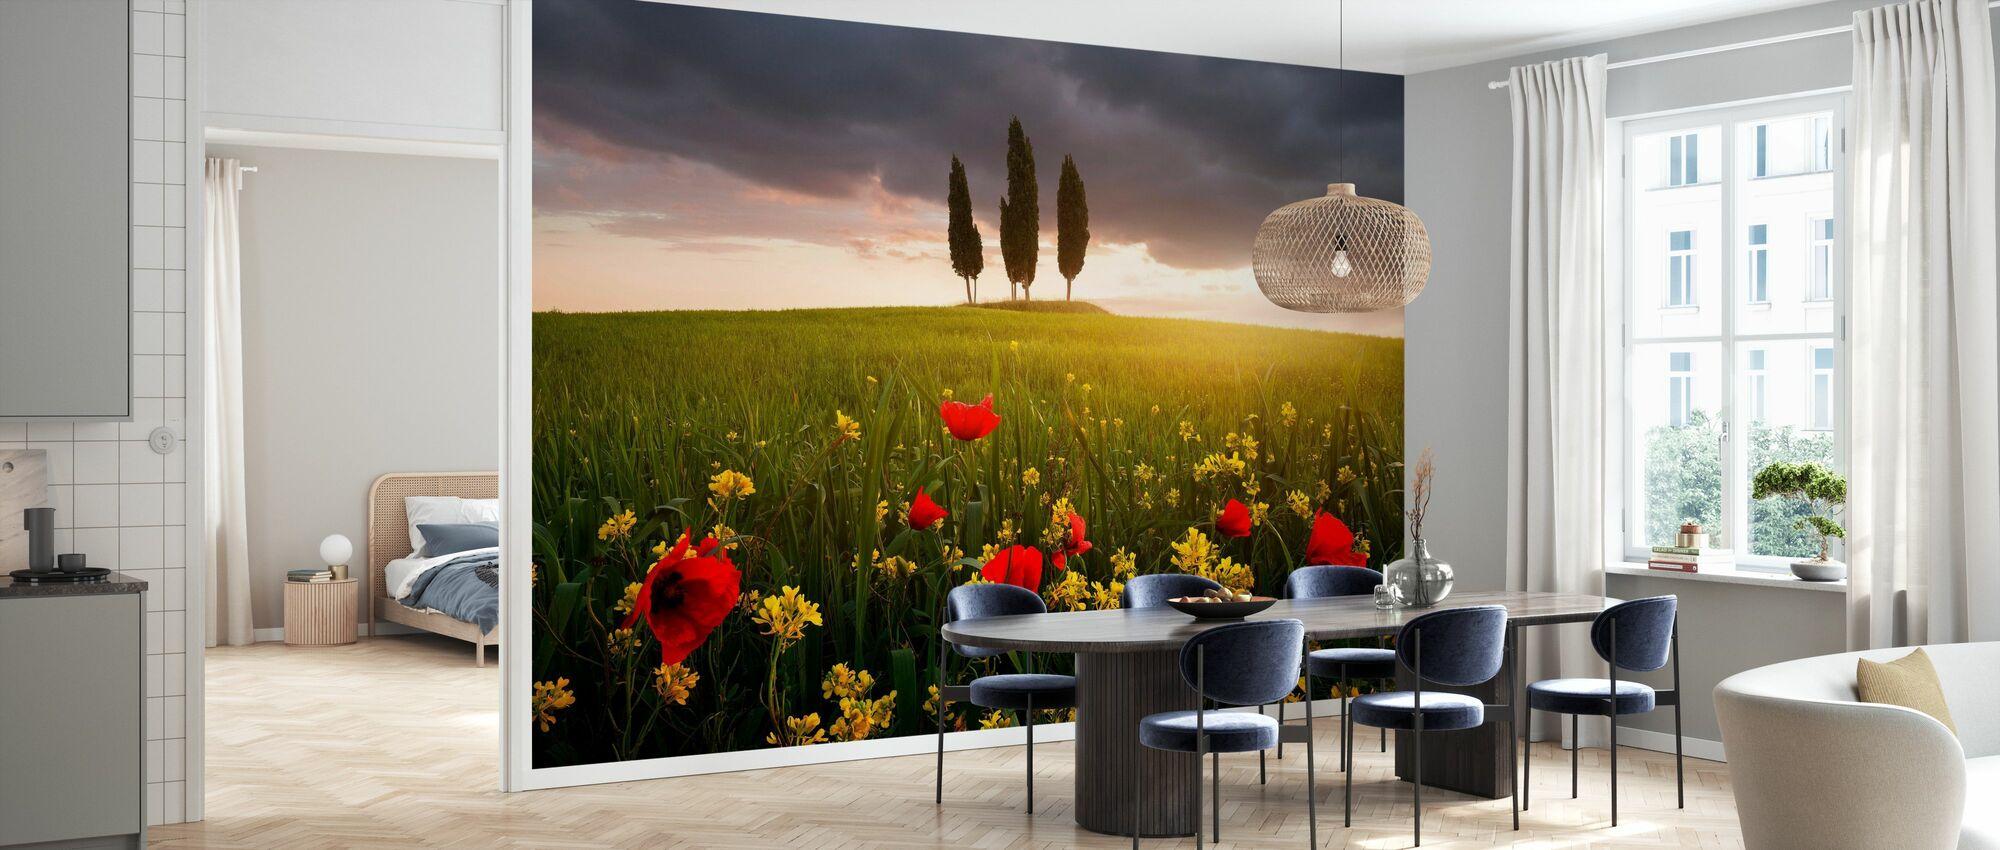 Blooming Tuscany - Wallpaper - Kitchen